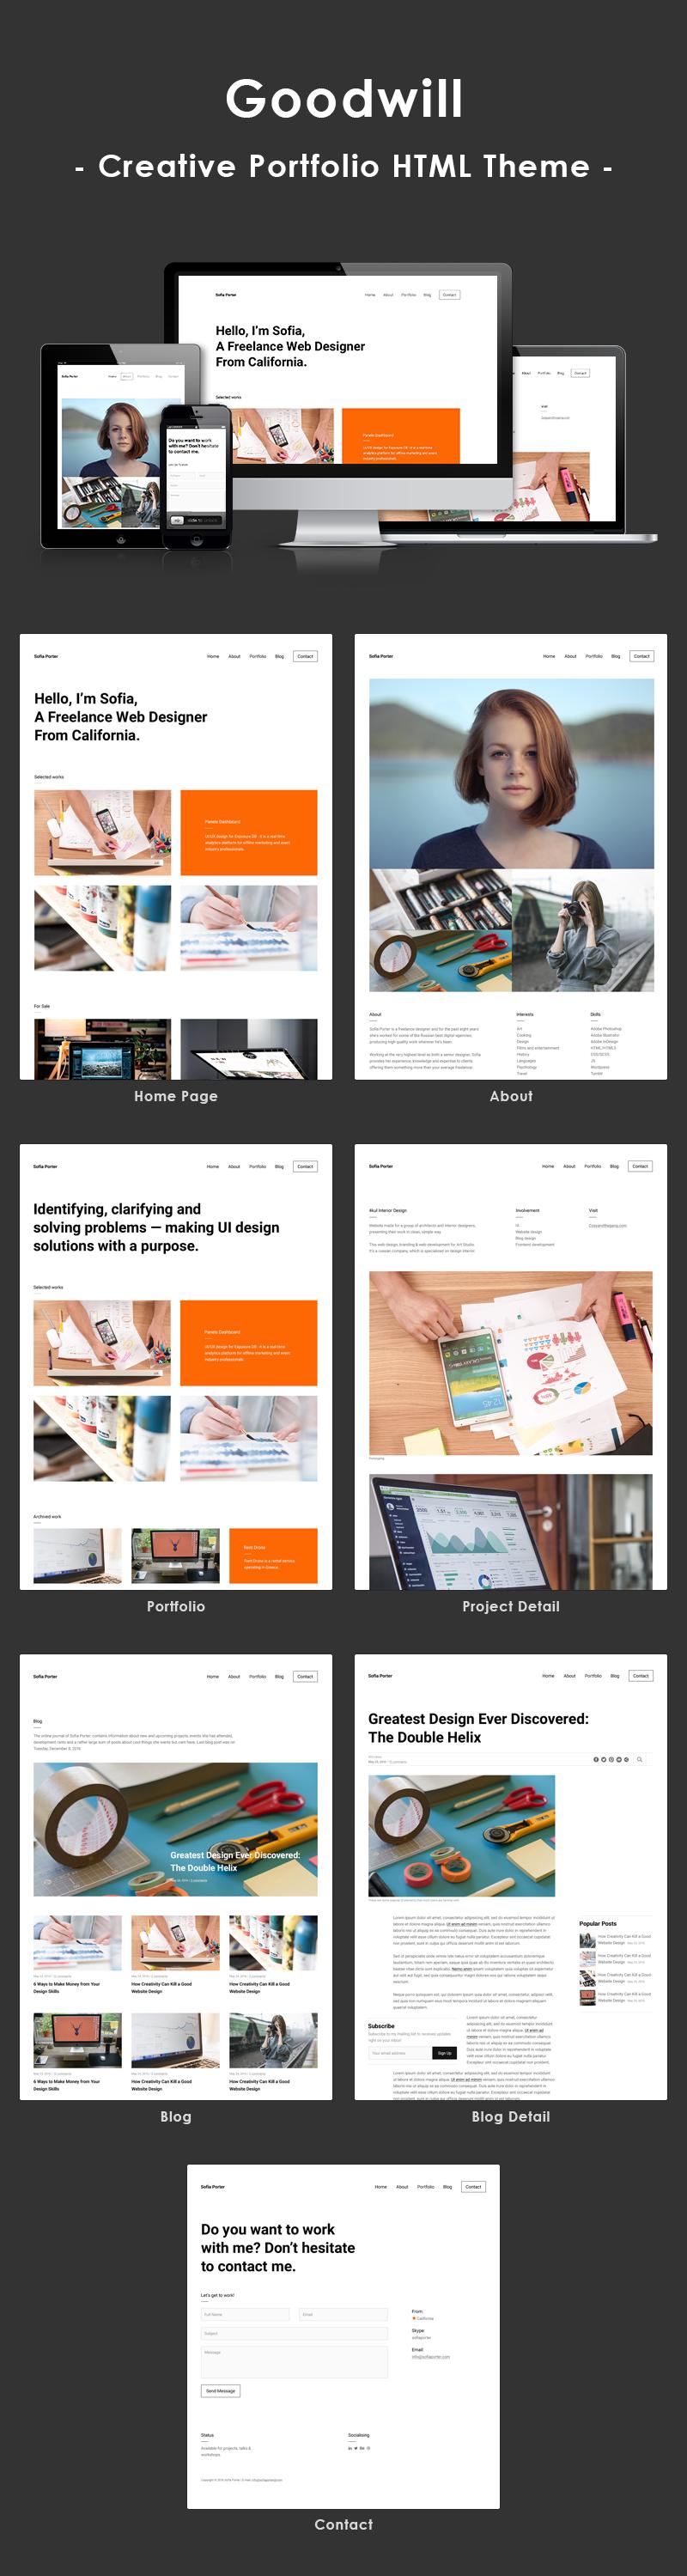 Goodwill – Creative, Clean, Portfolio Template - 1